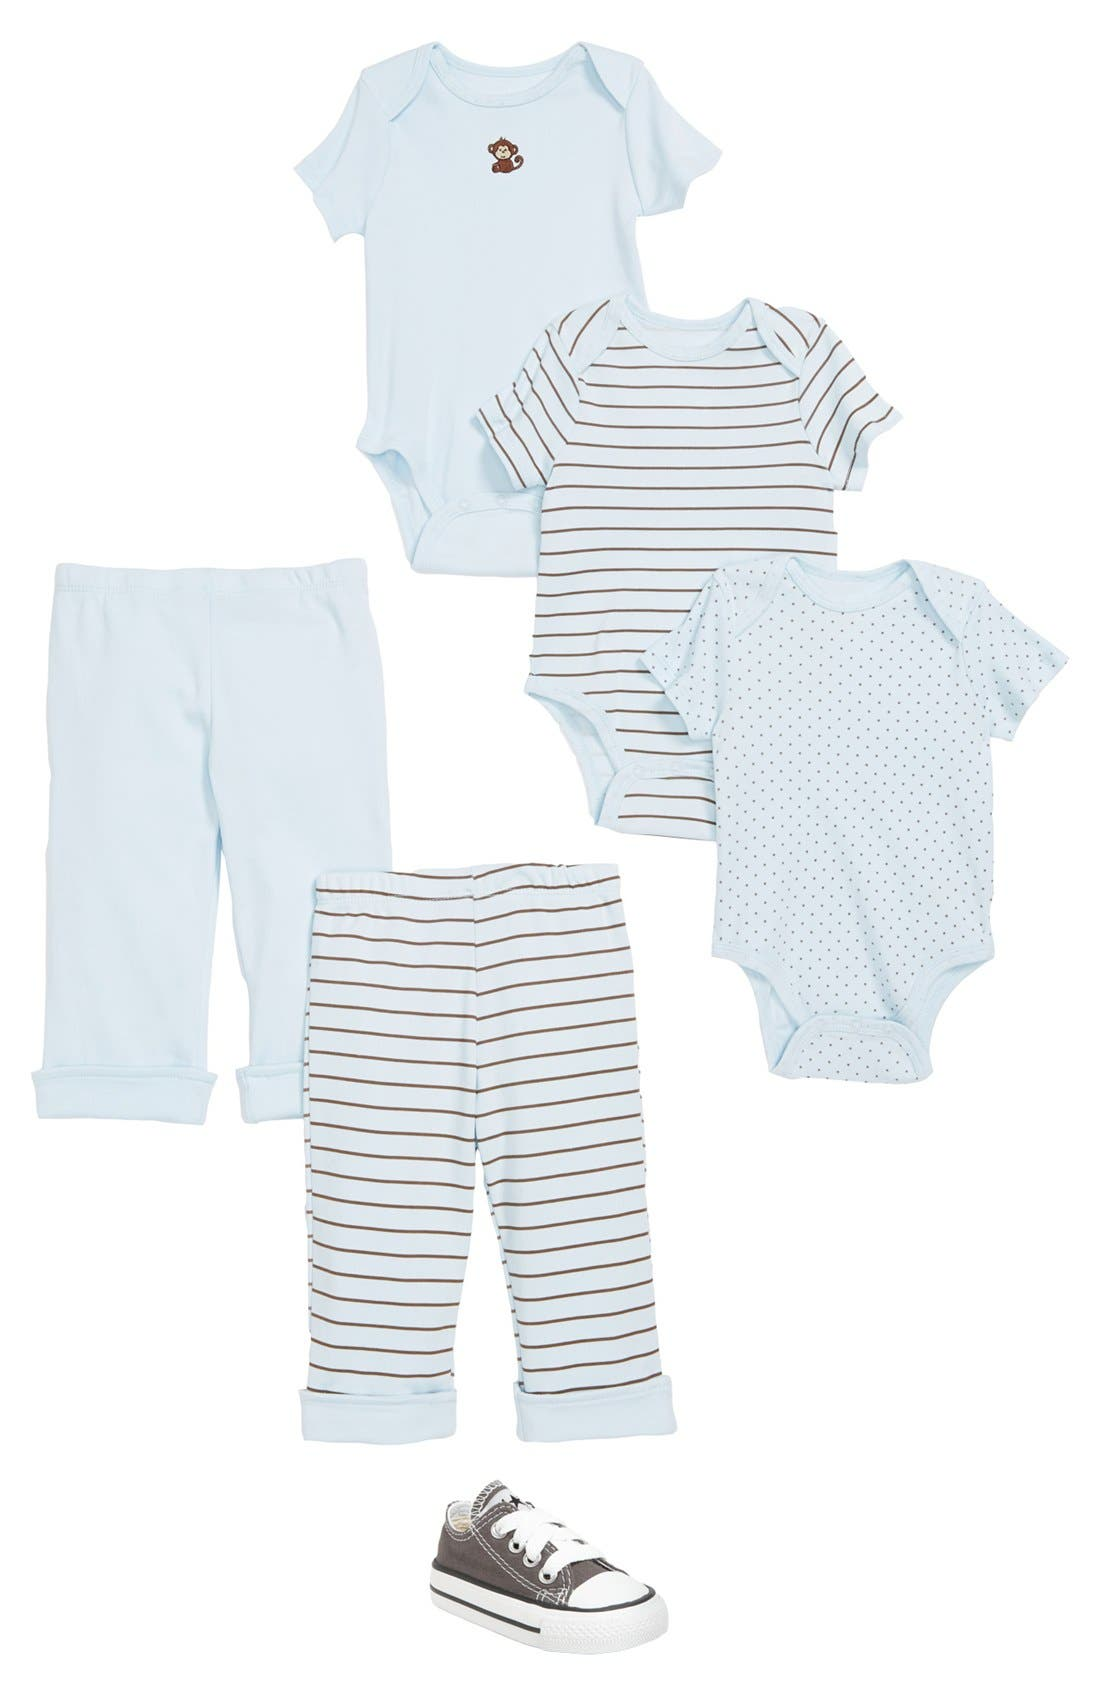 Alternate Image 2  - Little Me 'Monkey' Bodysuits (Set of 3) (Baby Boys)